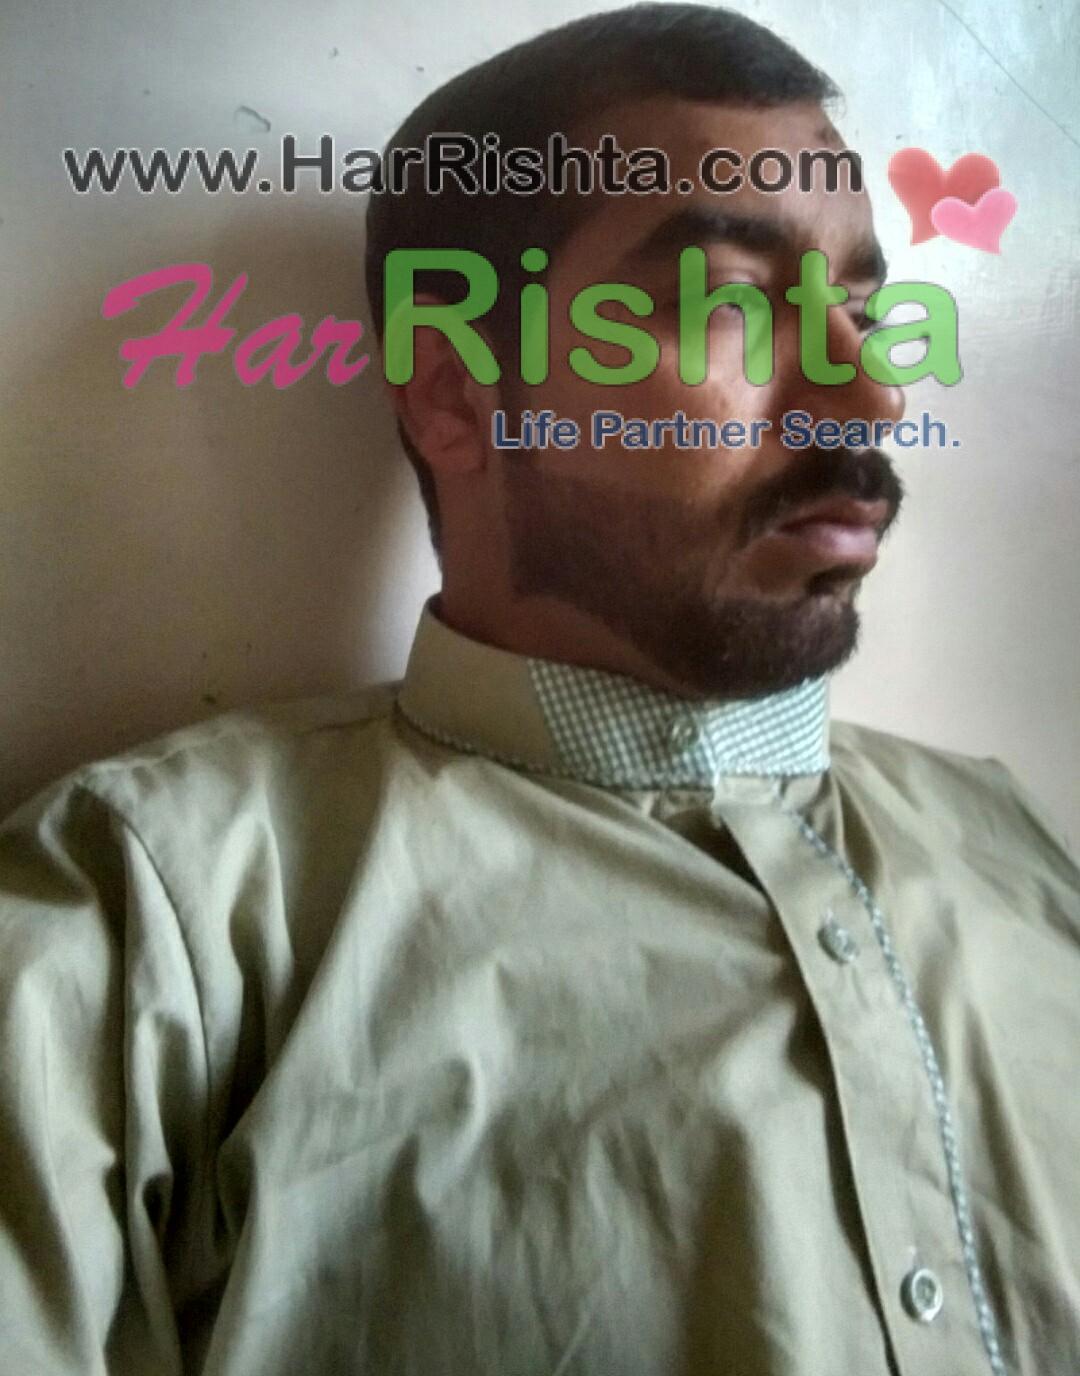 Popalzai Boy Rishta in Karachi